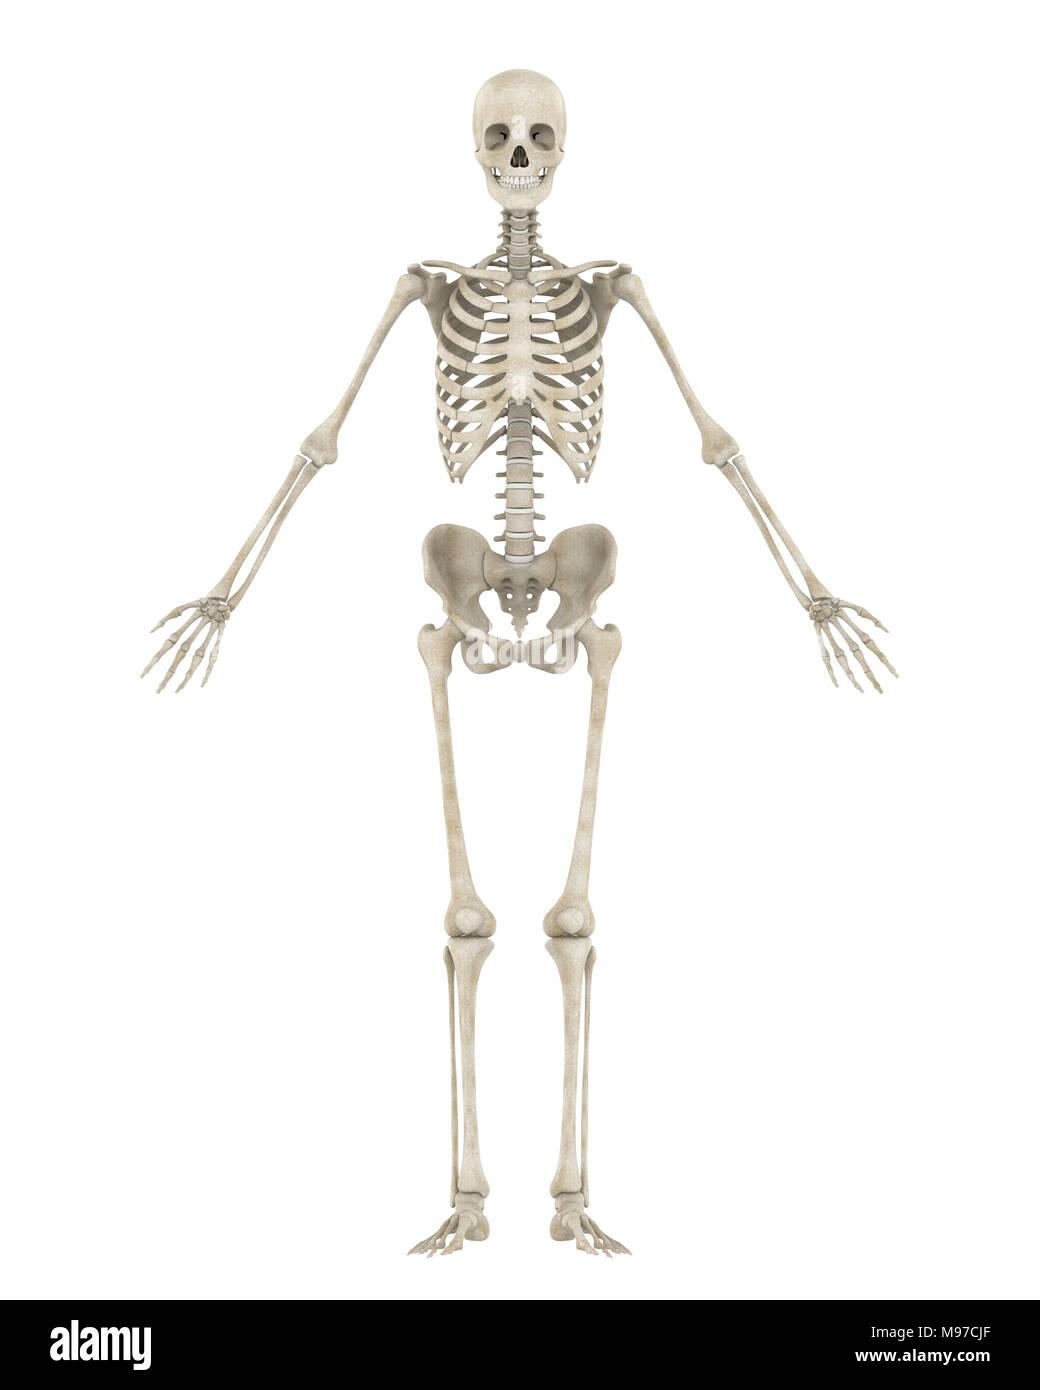 Bone System Stockfotos & Bone System Bilder - Alamy